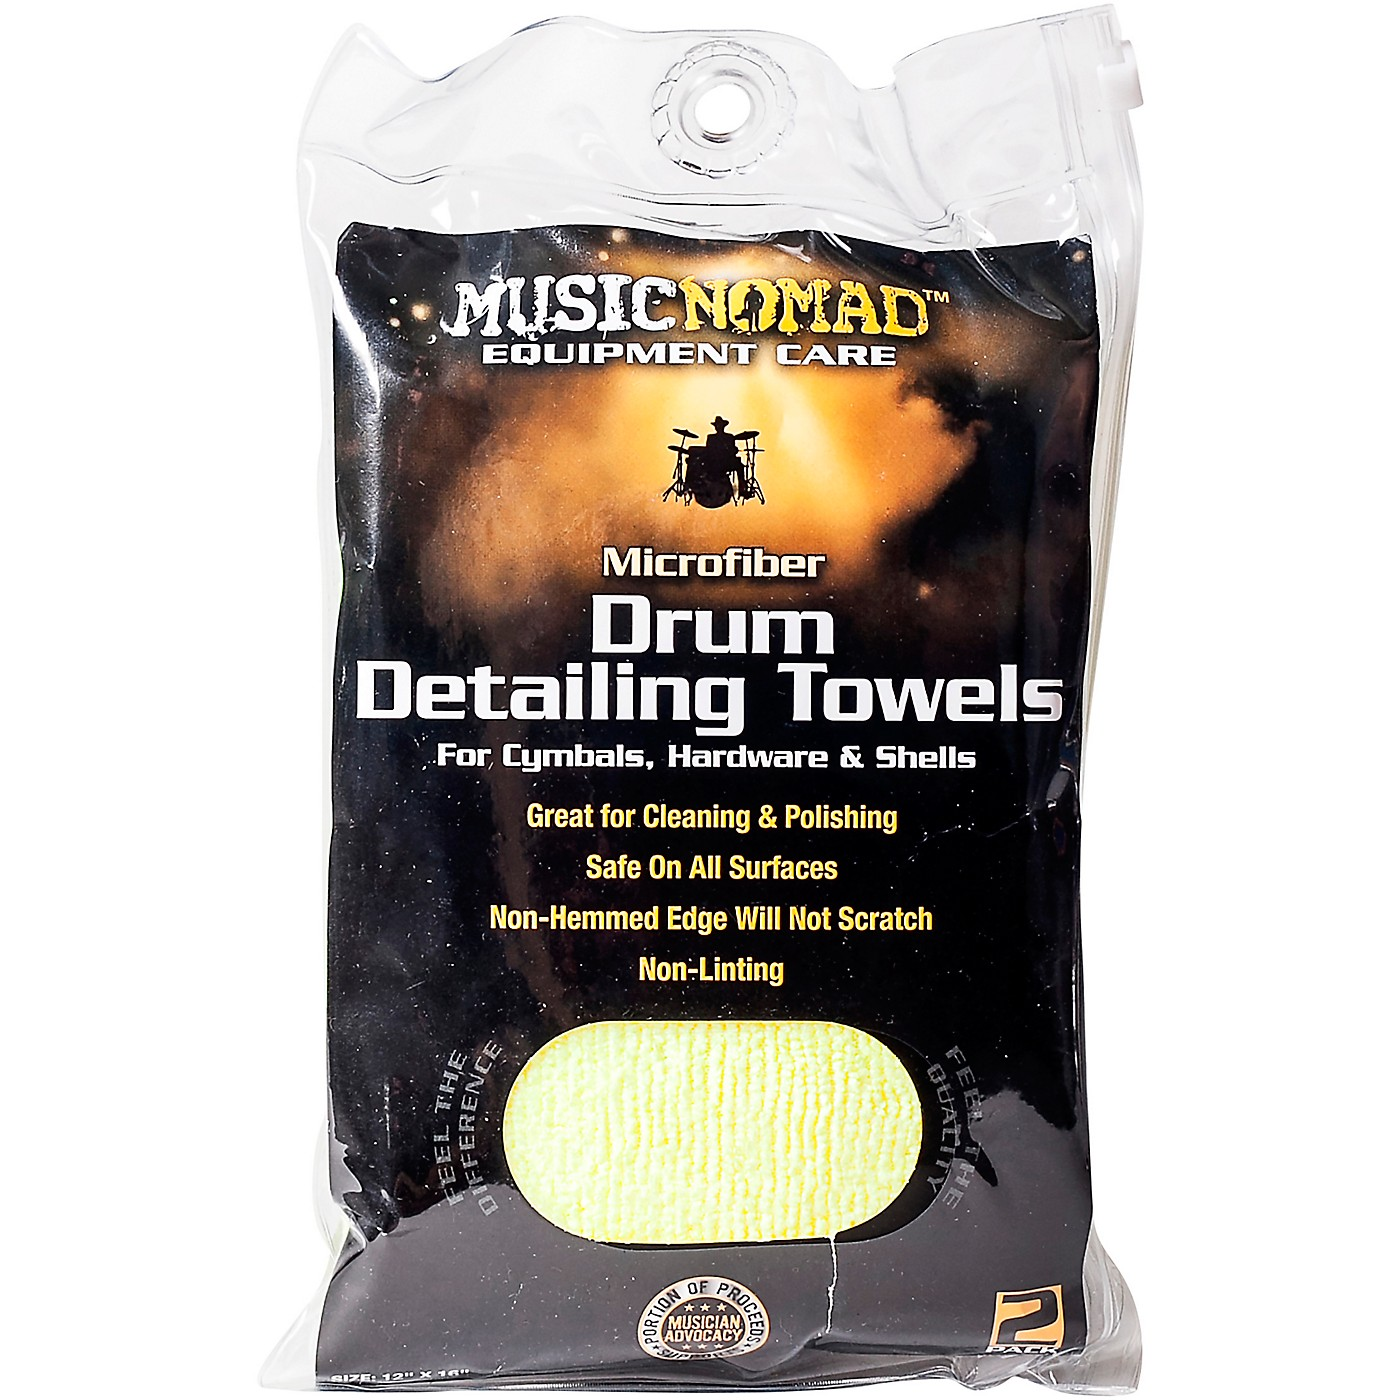 Music Nomad Edgeless Microfiber Drum Detailing Towels - 2 pack thumbnail